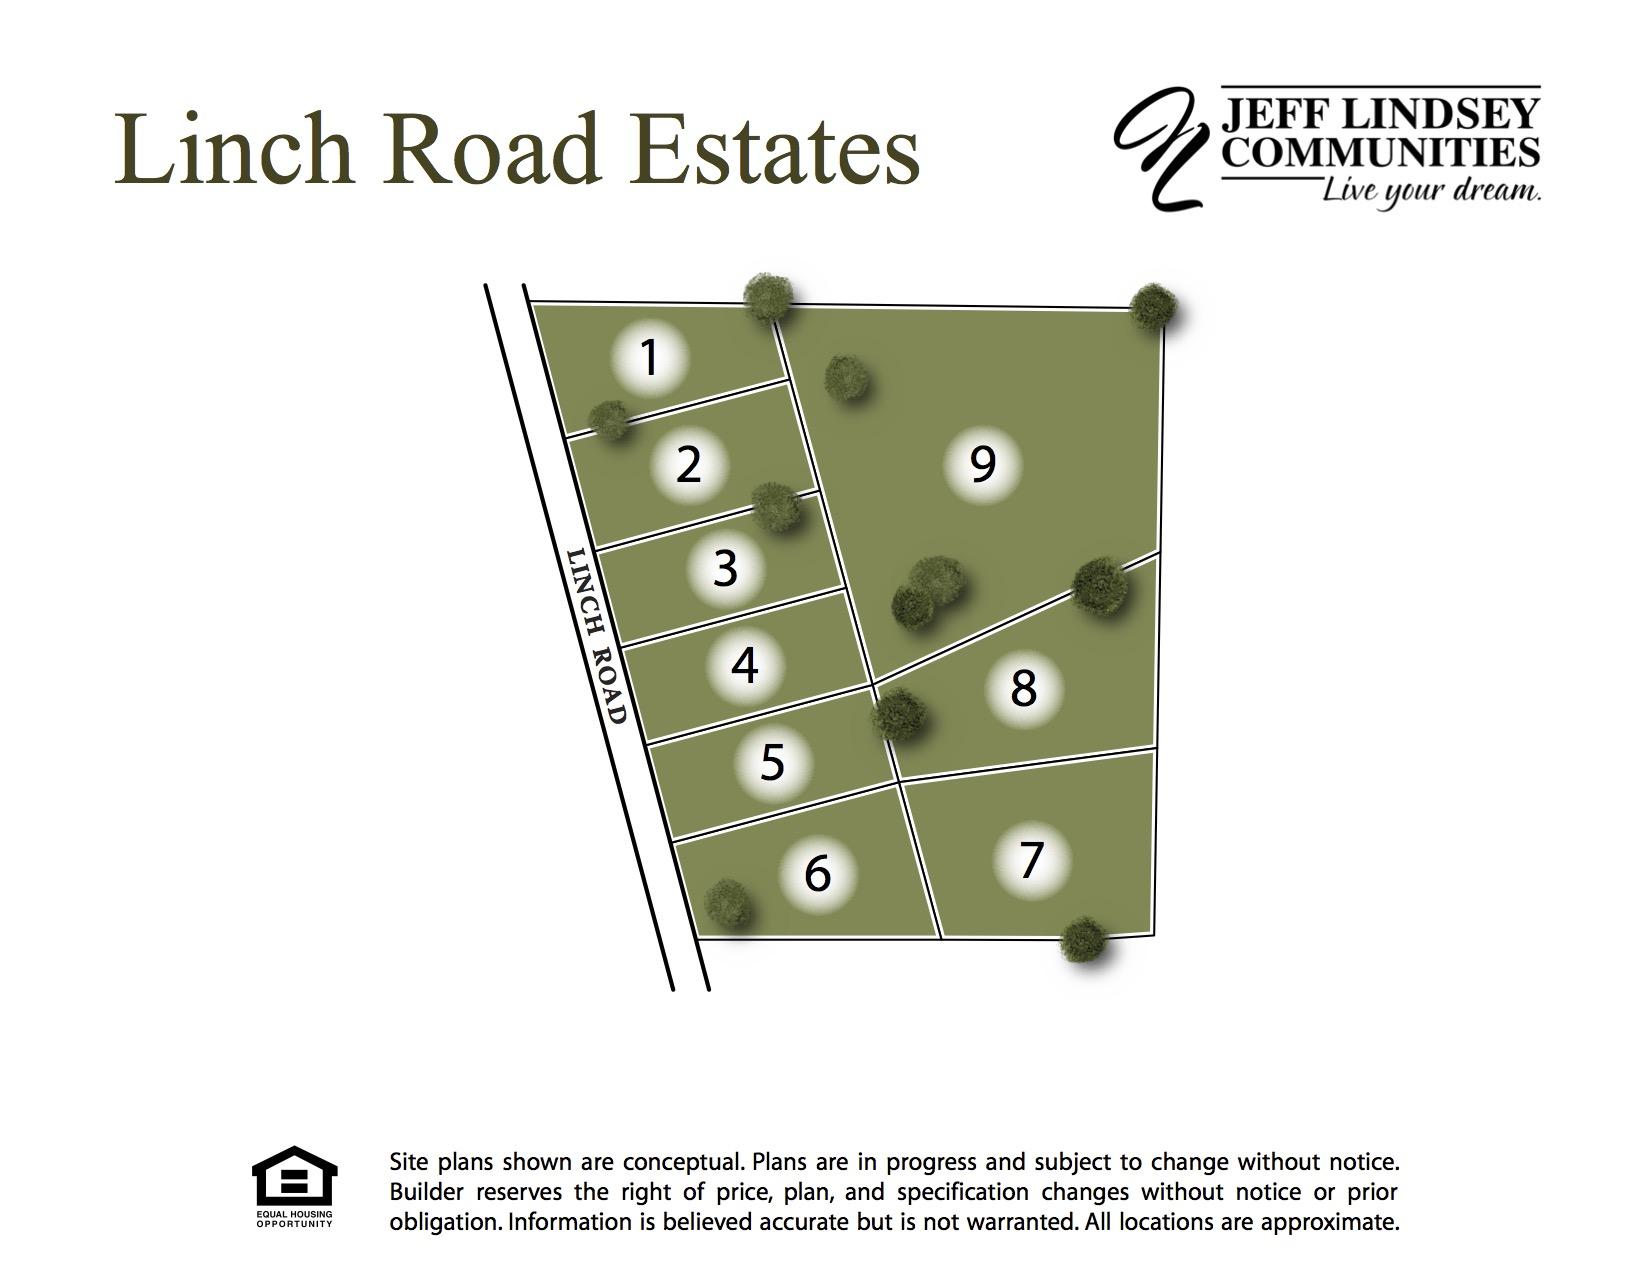 Linch Road Estates Site Map